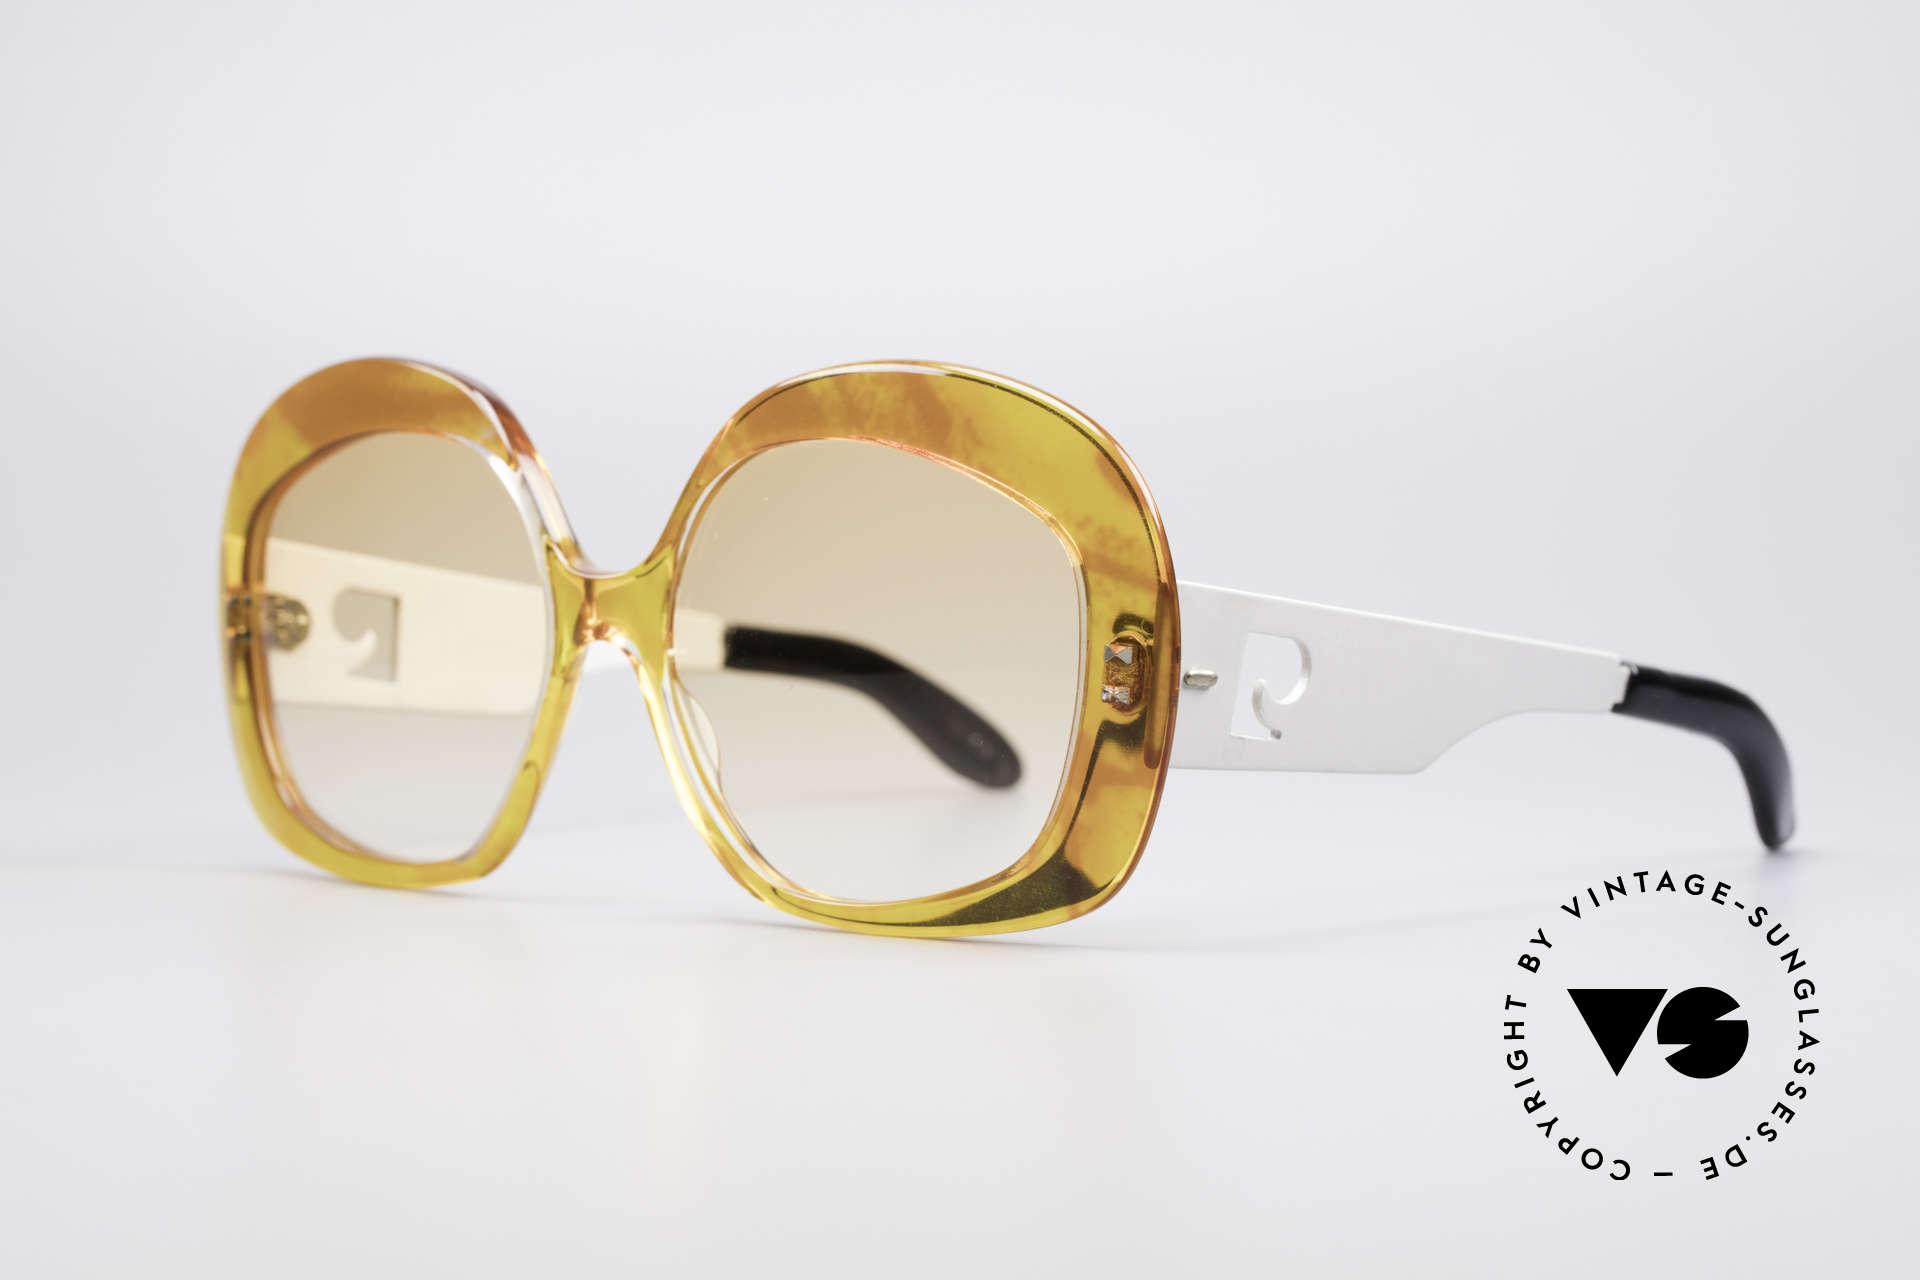 Pierre Cardin 734 XXL 70's Sunglasses, oversized XL frame - striking styling; eye-catcher!, Made for Women